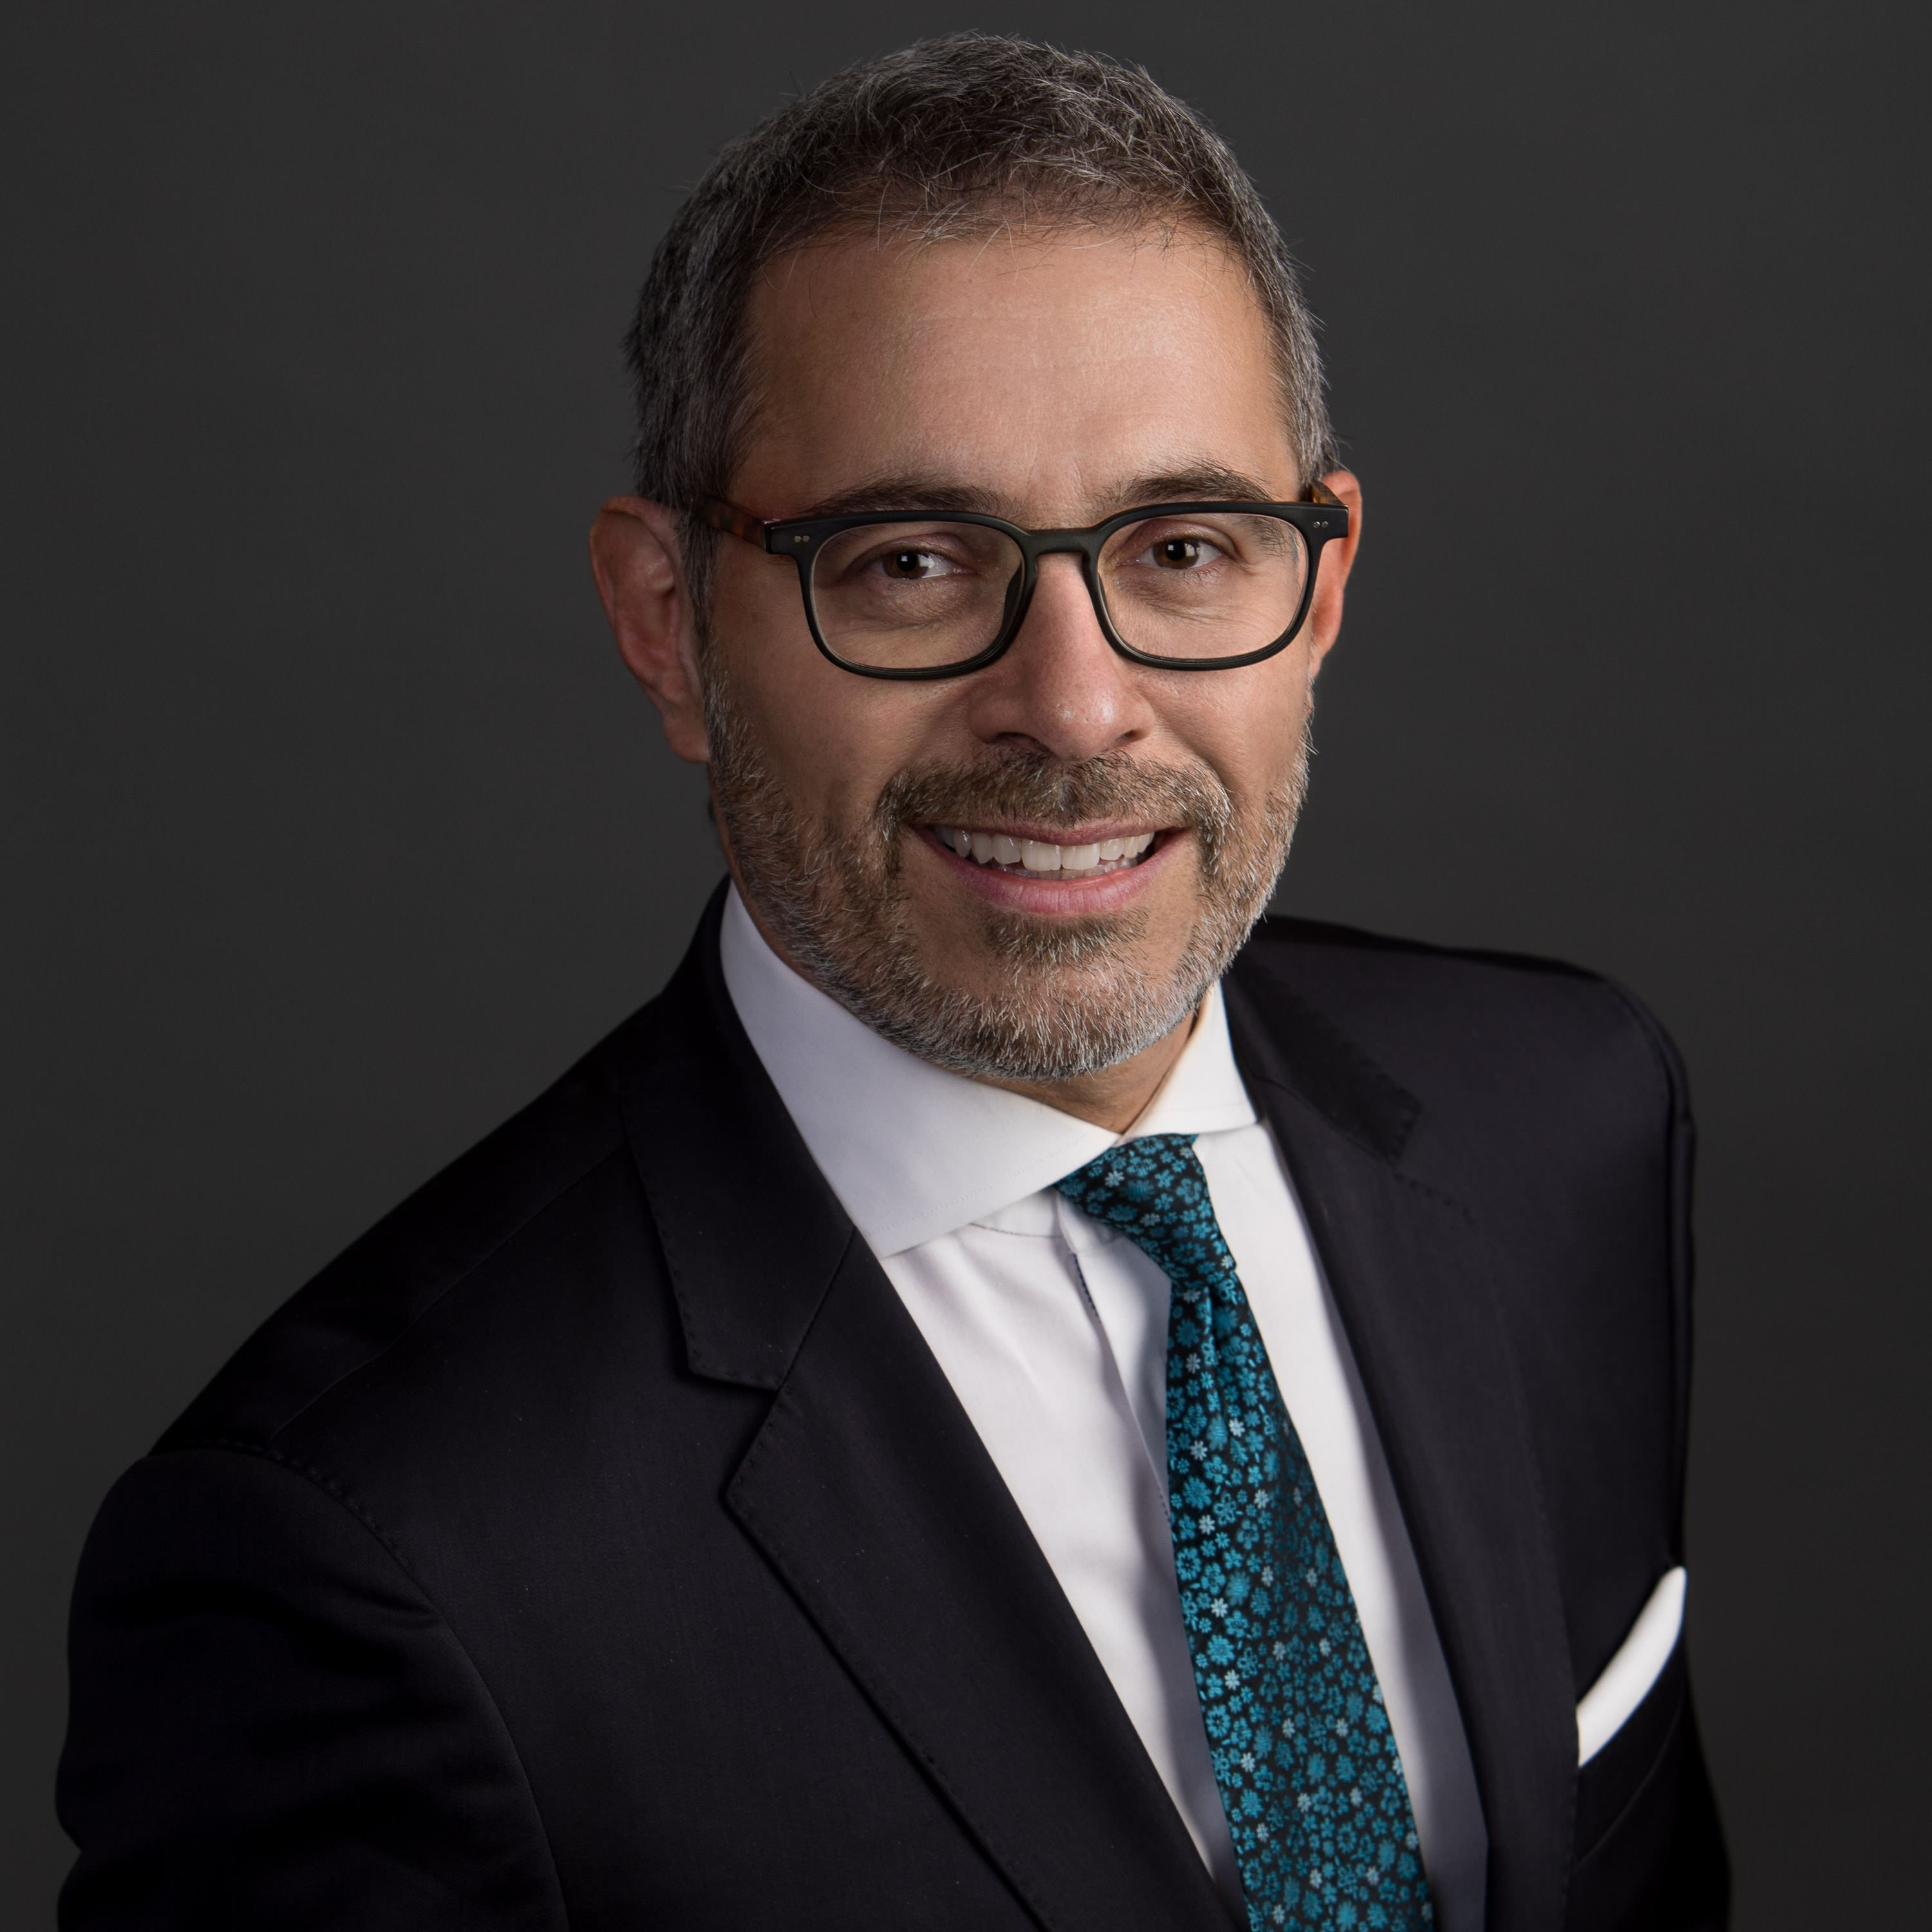 Joe Gagliardi, FCPA, FCMA, ICD. D